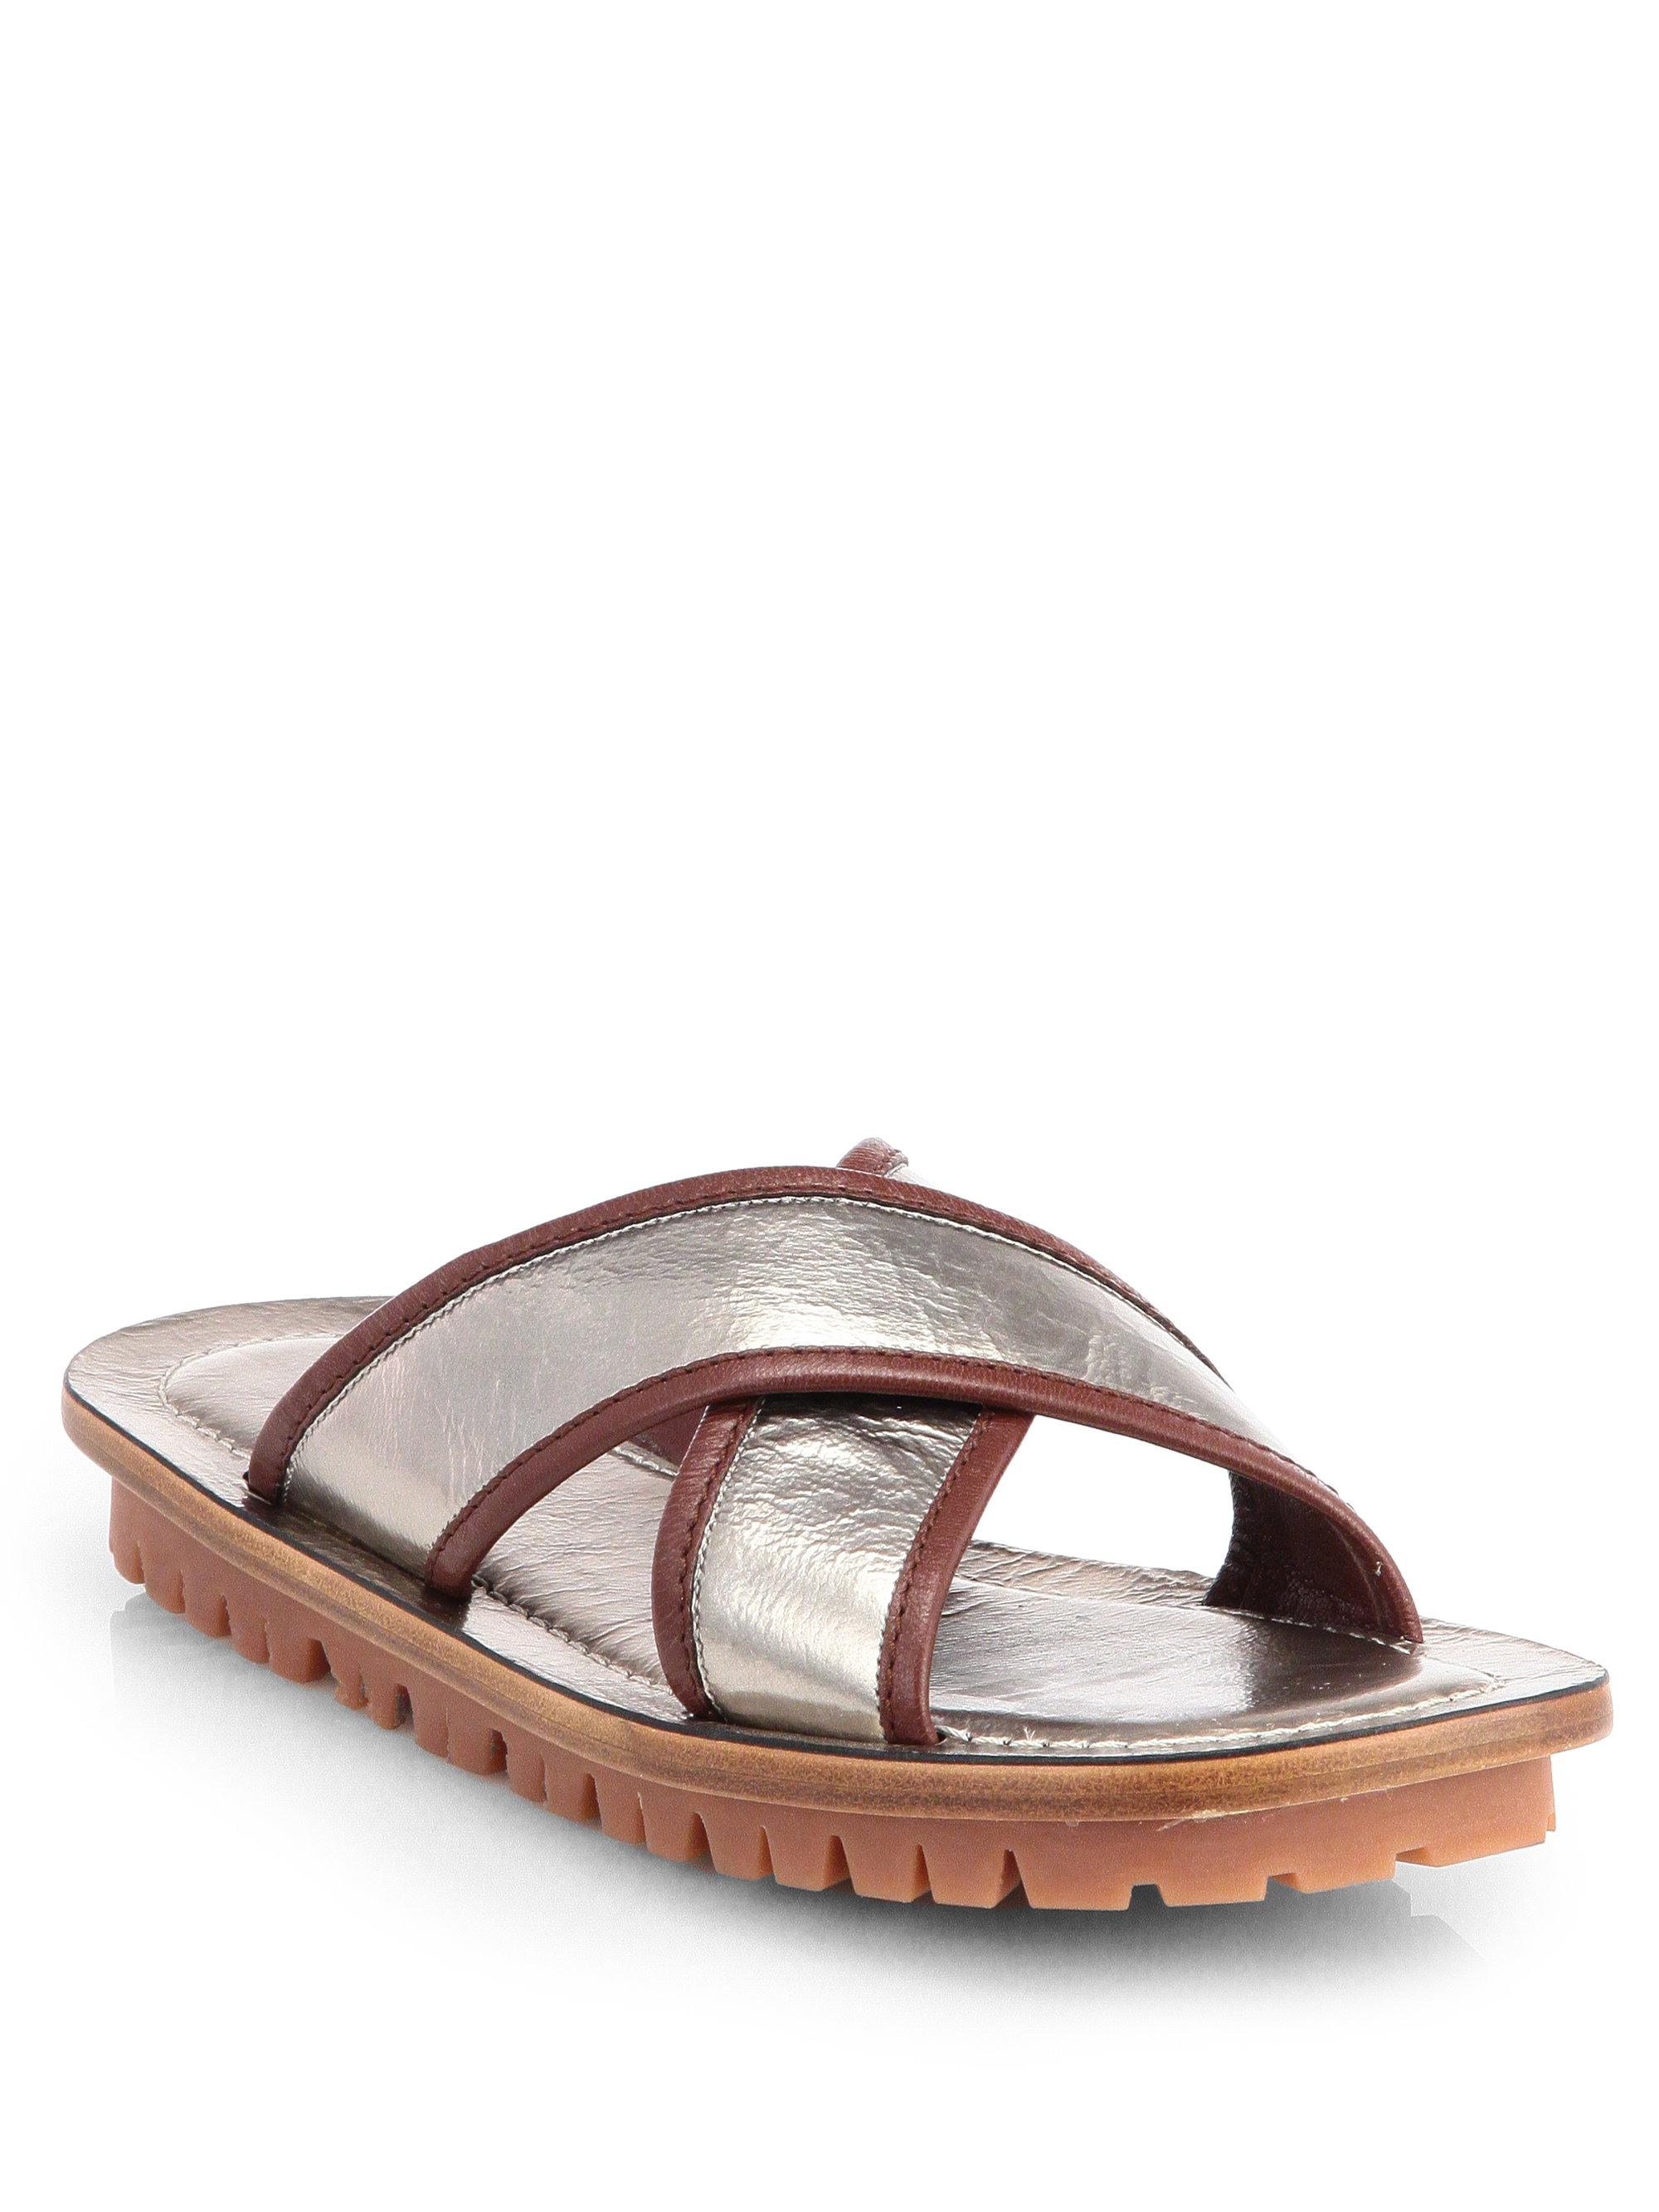 footlocker finishline cheap price cheap good selling Marc Jacobs Satin Crossover Sandals 1V4vnu